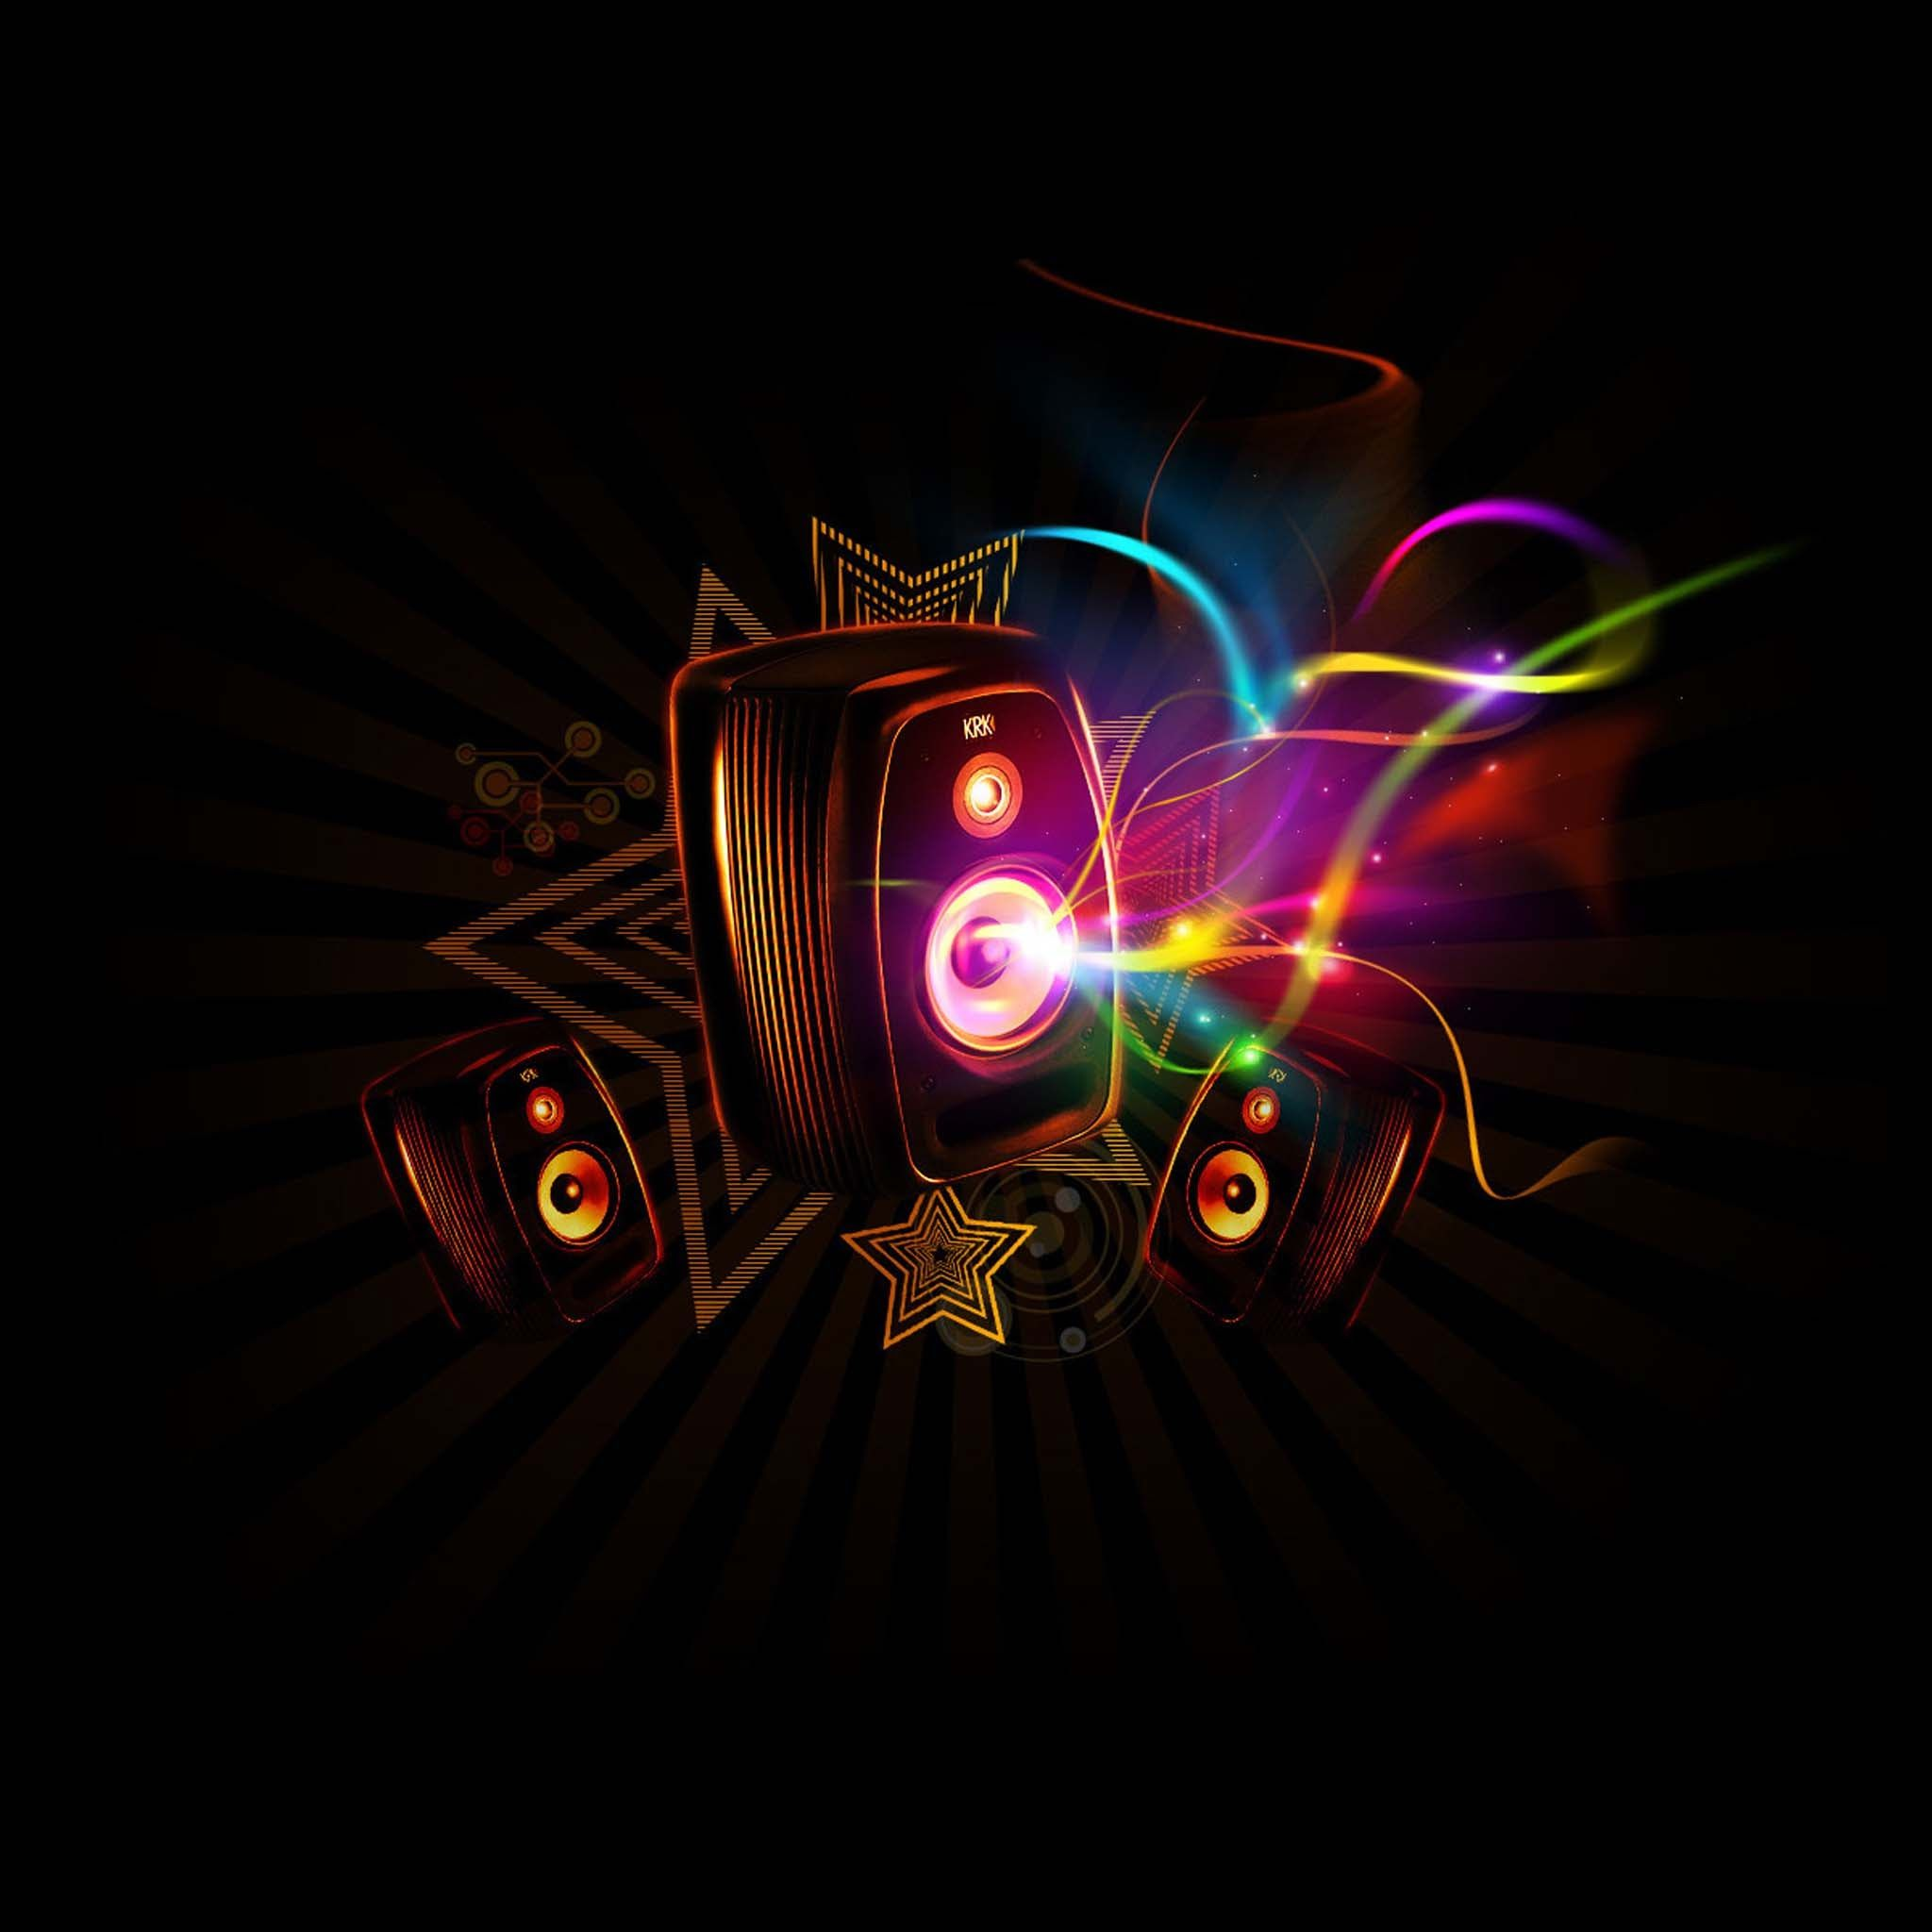 Most Inspiring Wallpaper Music Bright - b9cda64195924f741c7b3fd5f07a6bae  Photograph_295164.jpg